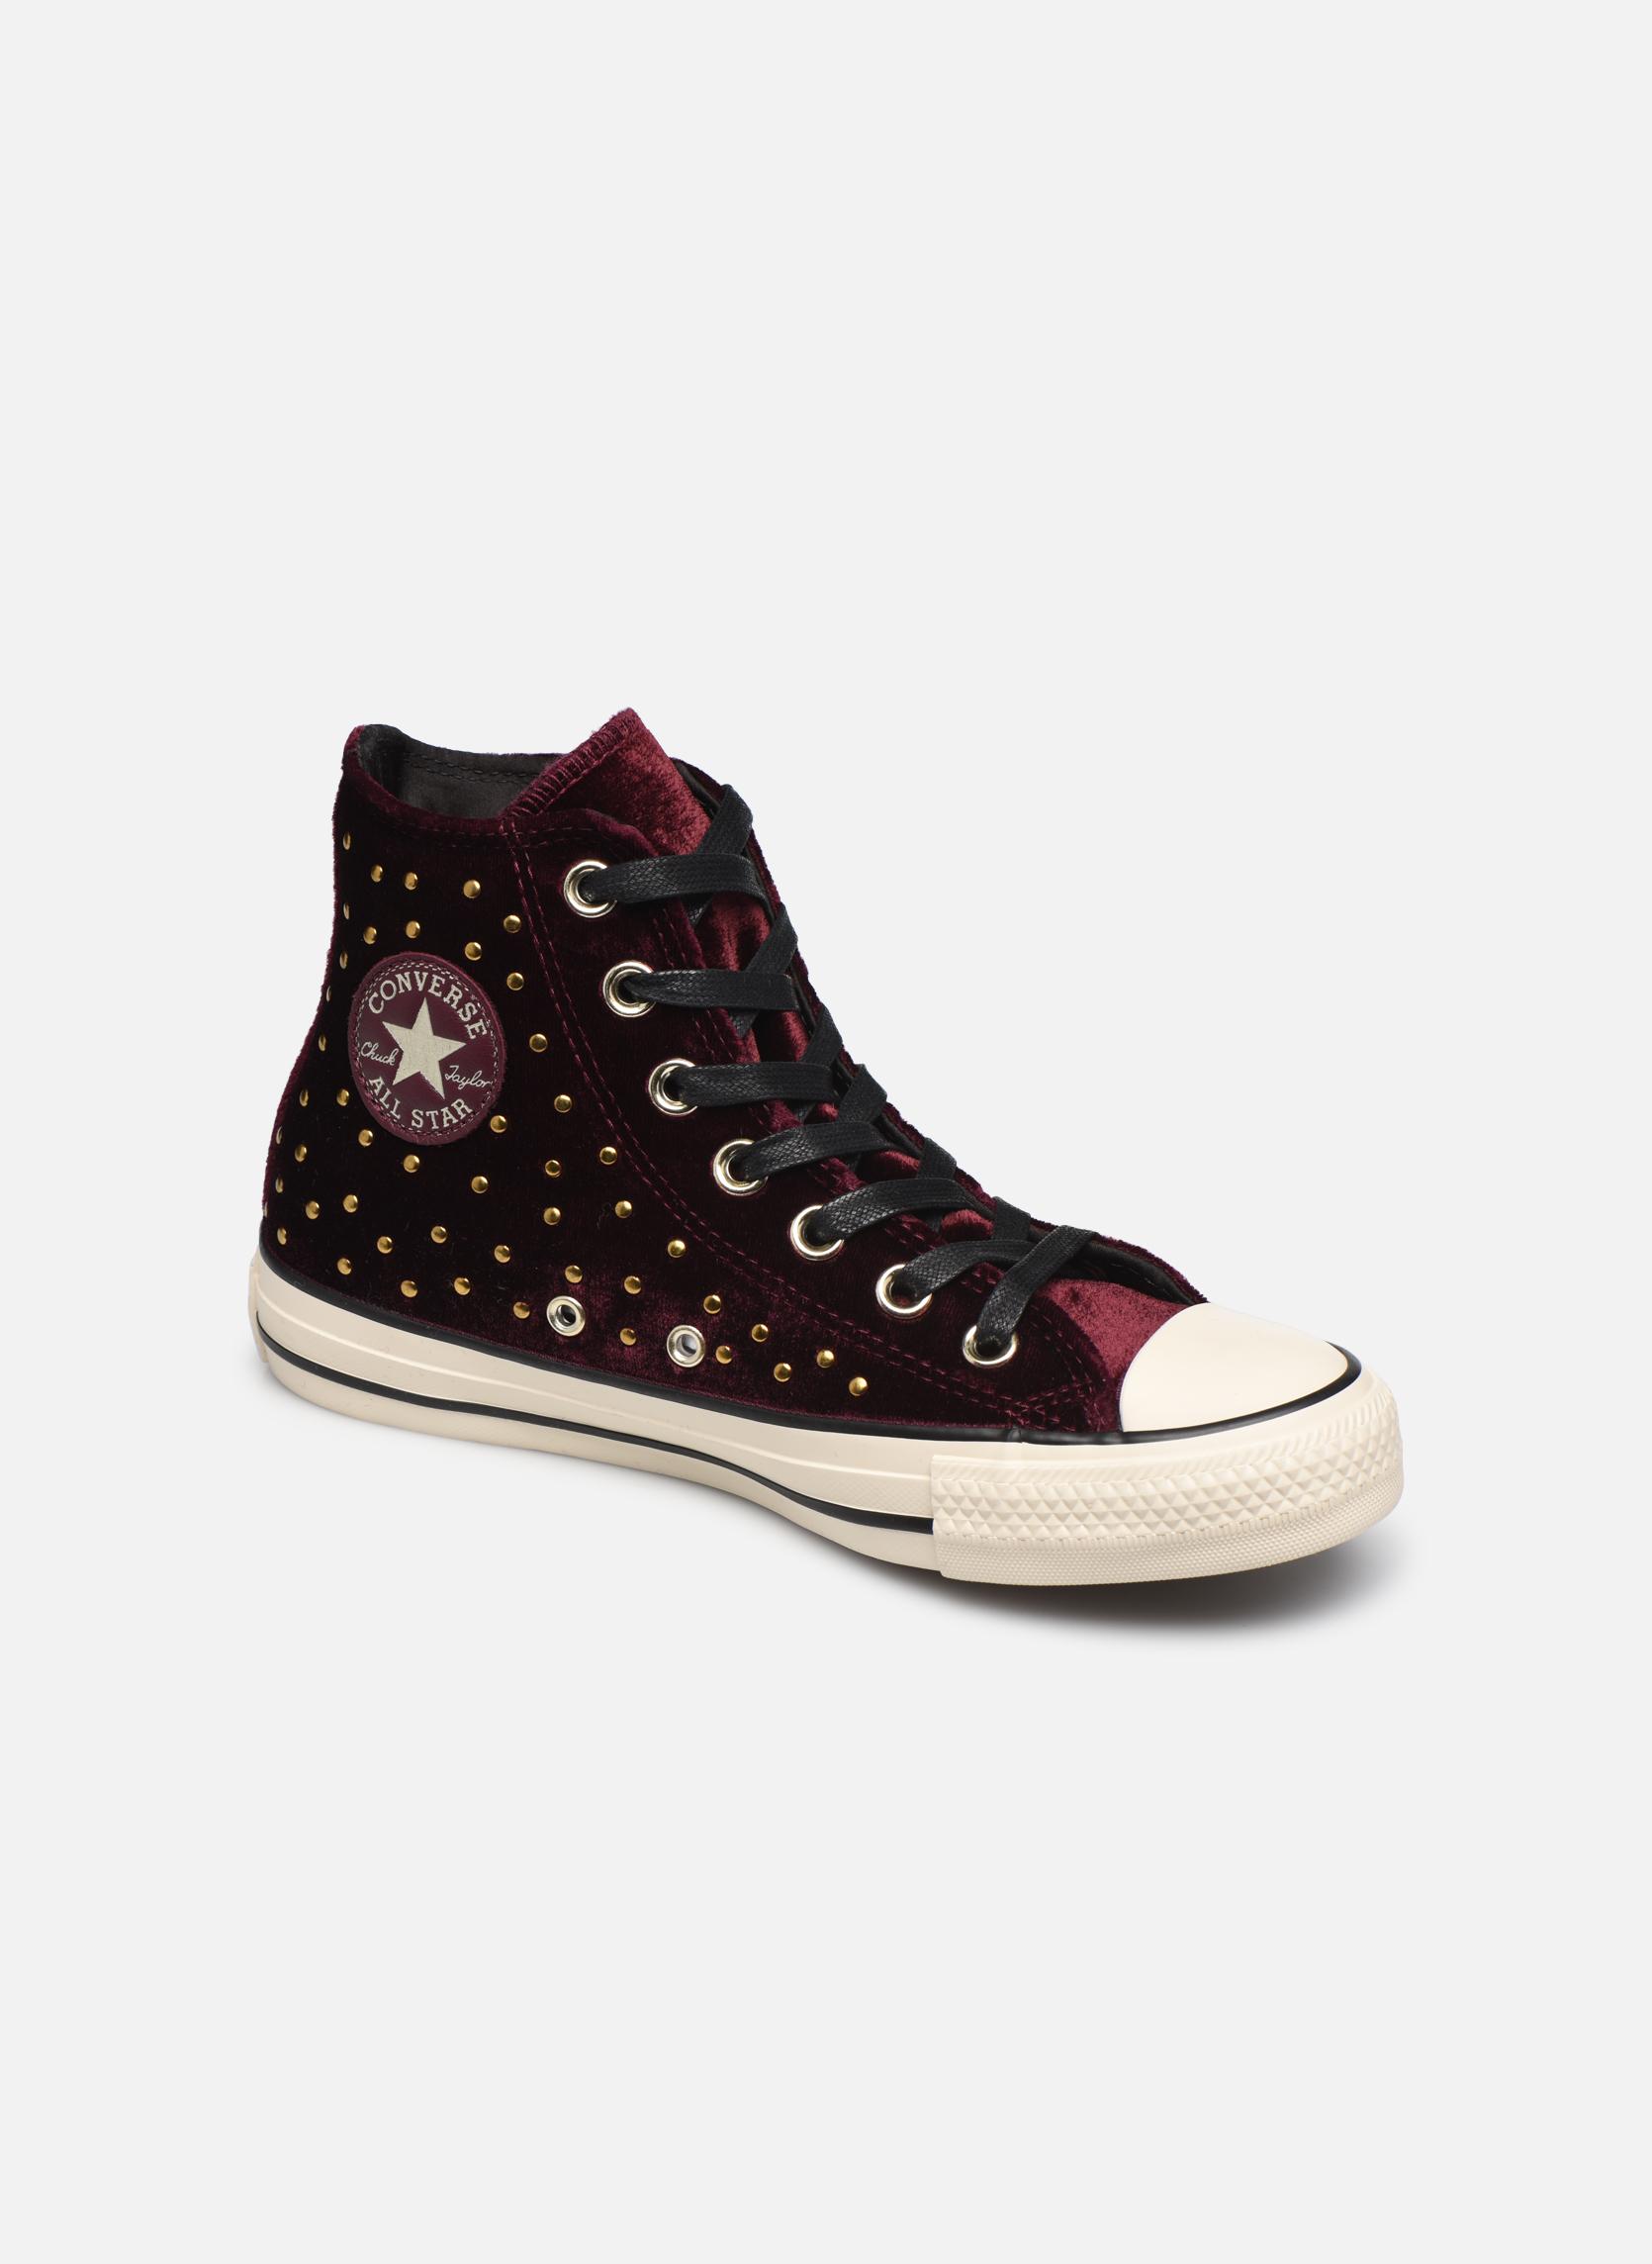 Sneakers Donna Chuck Taylor All Star Velvet Studs Hi